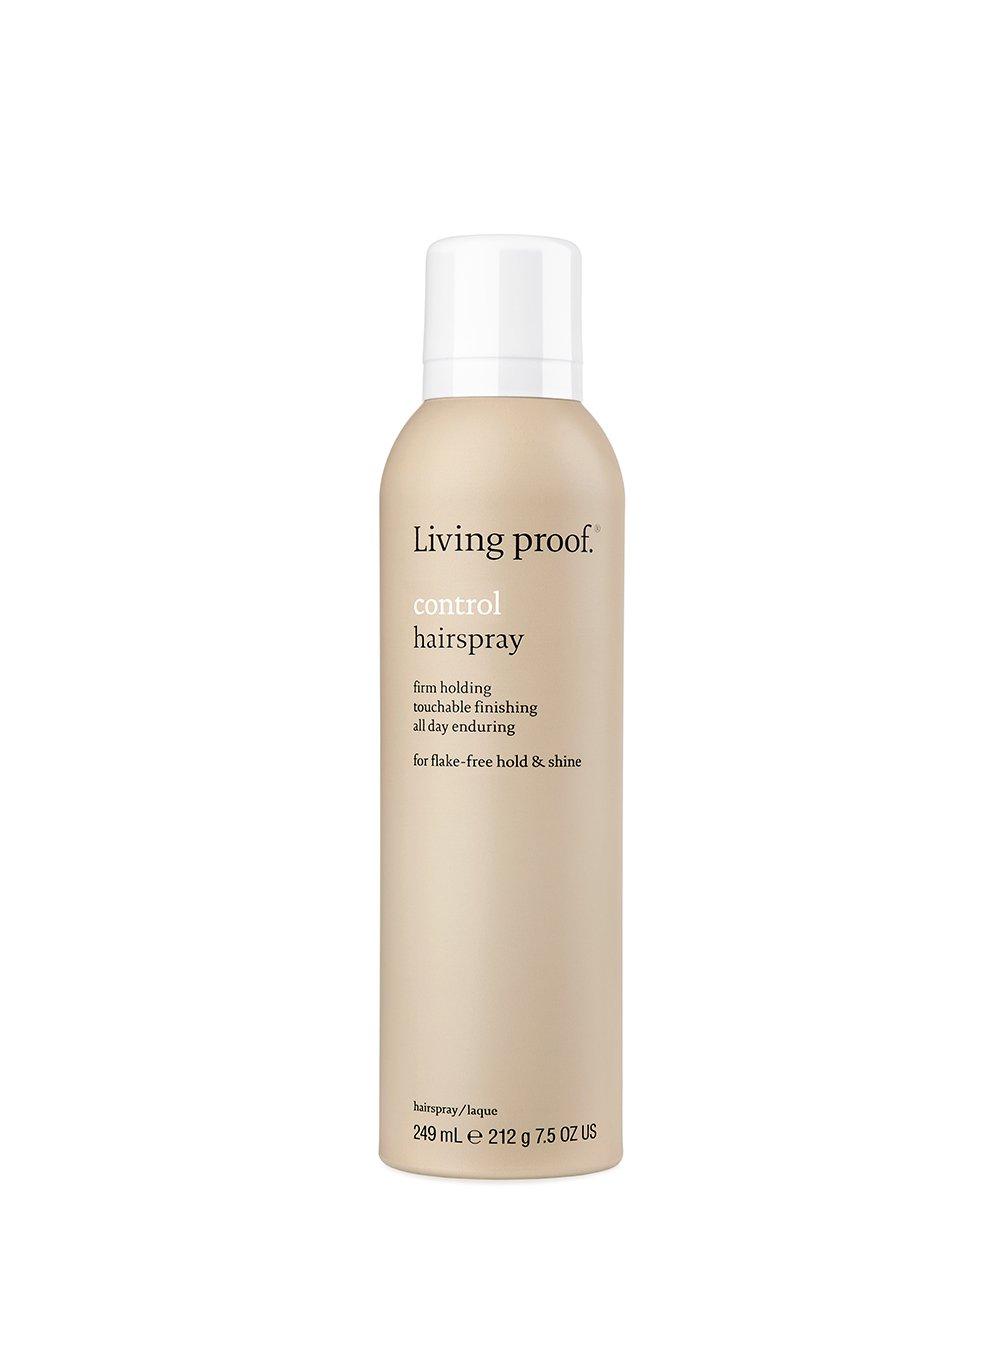 Living Proof Control Fixing Hairspray, 249 ml 0850426007028